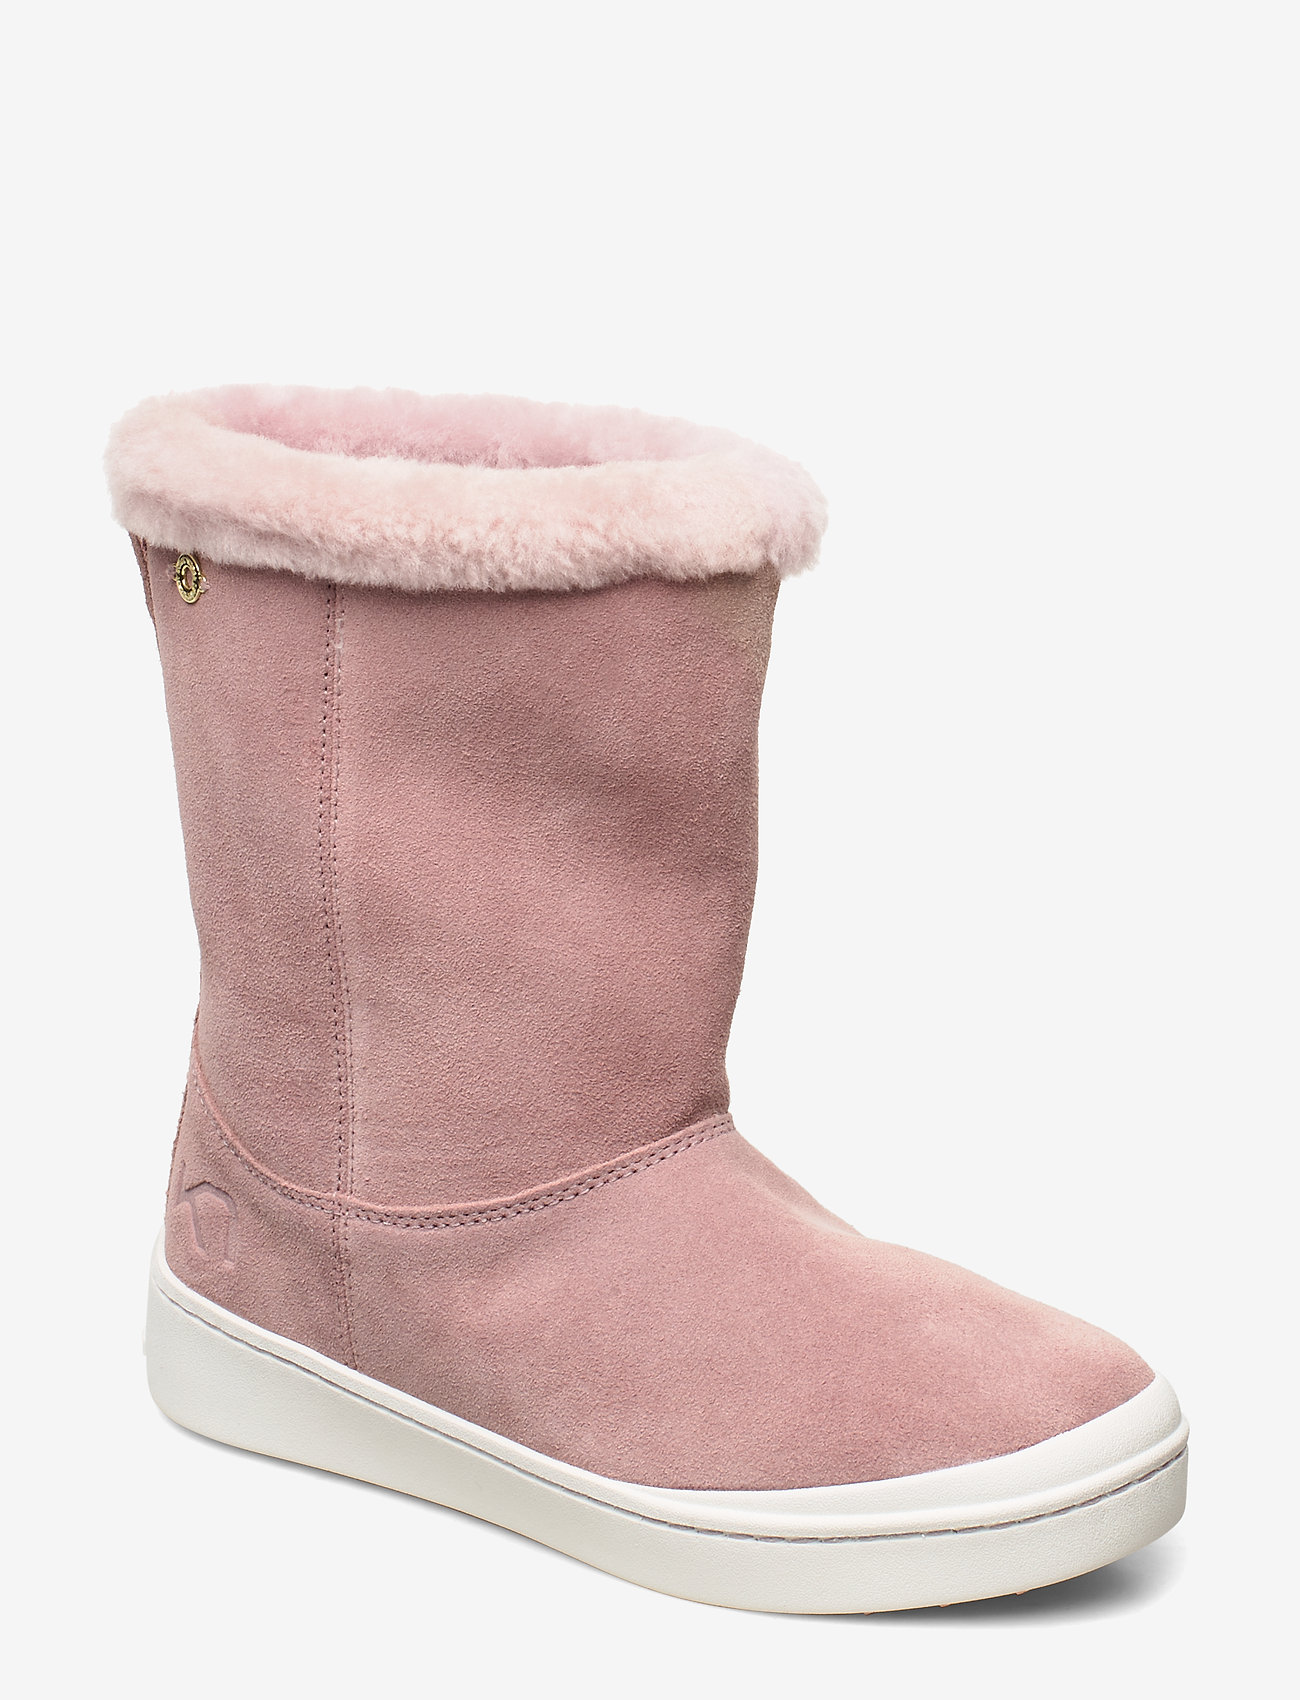 Kari Traa - STEG - flat ankle boots - petal - 0